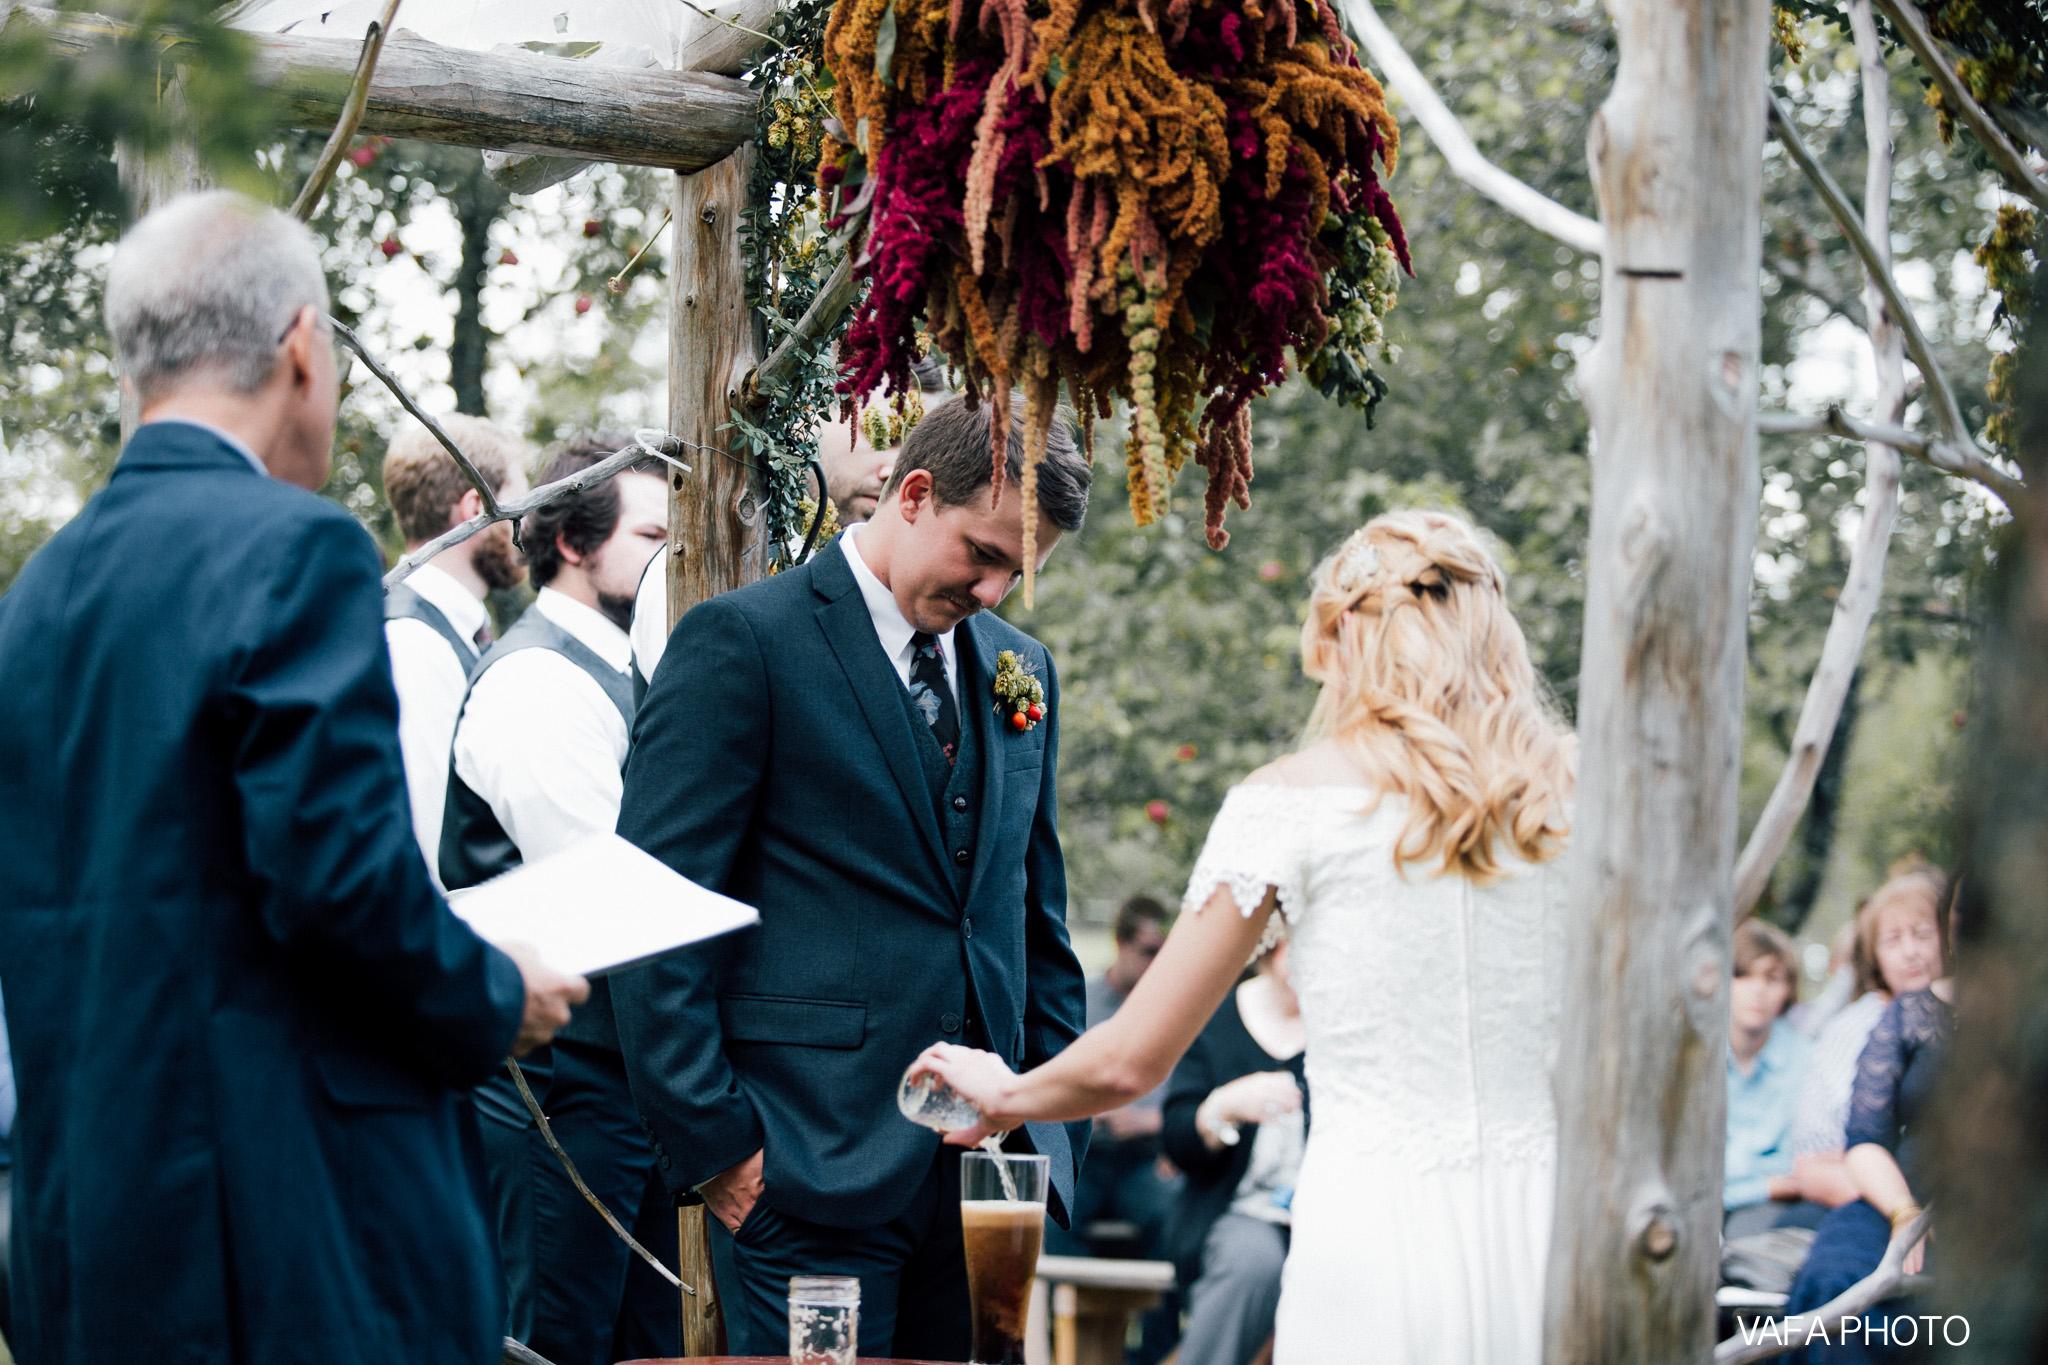 Belsolda-Farm-Wedding-Christy-Eric-Vafa-Photo-449.jpg